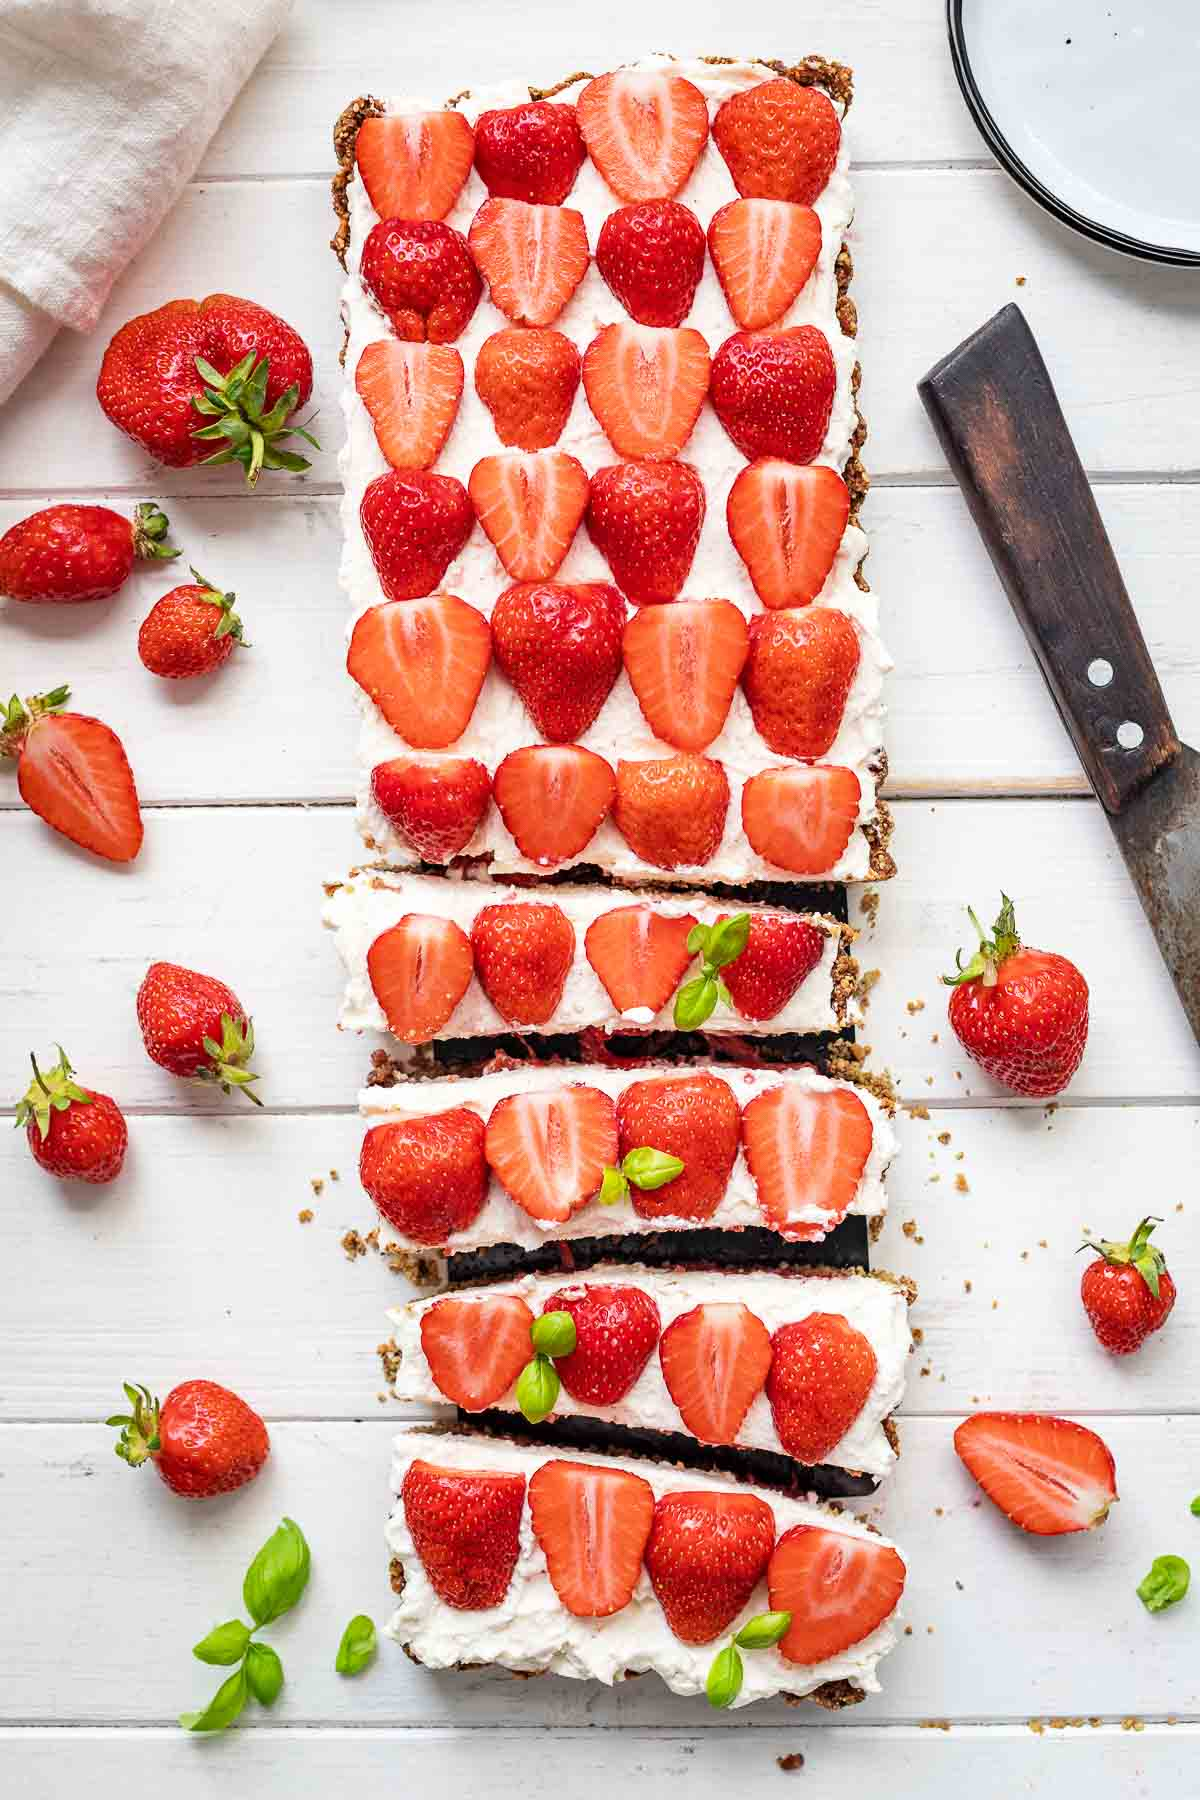 Erdbeer-Tarte mit Mascarpone-Creme | Rezept | Elle Republic